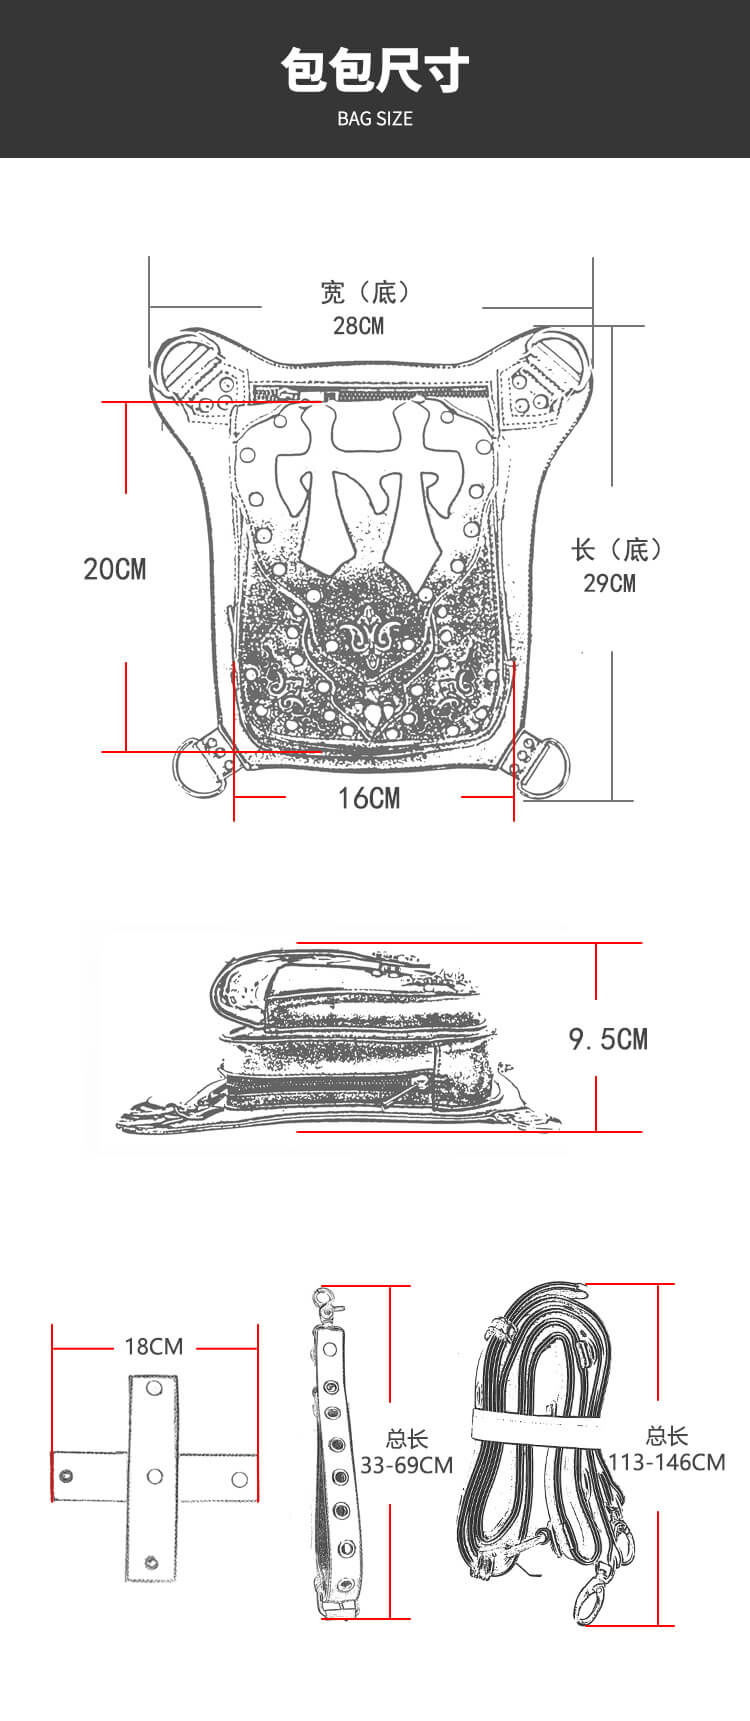 CMX GETFASIONBAGS Flap Waist Bags Unisex Cross Leather Thigh Packs detail 1